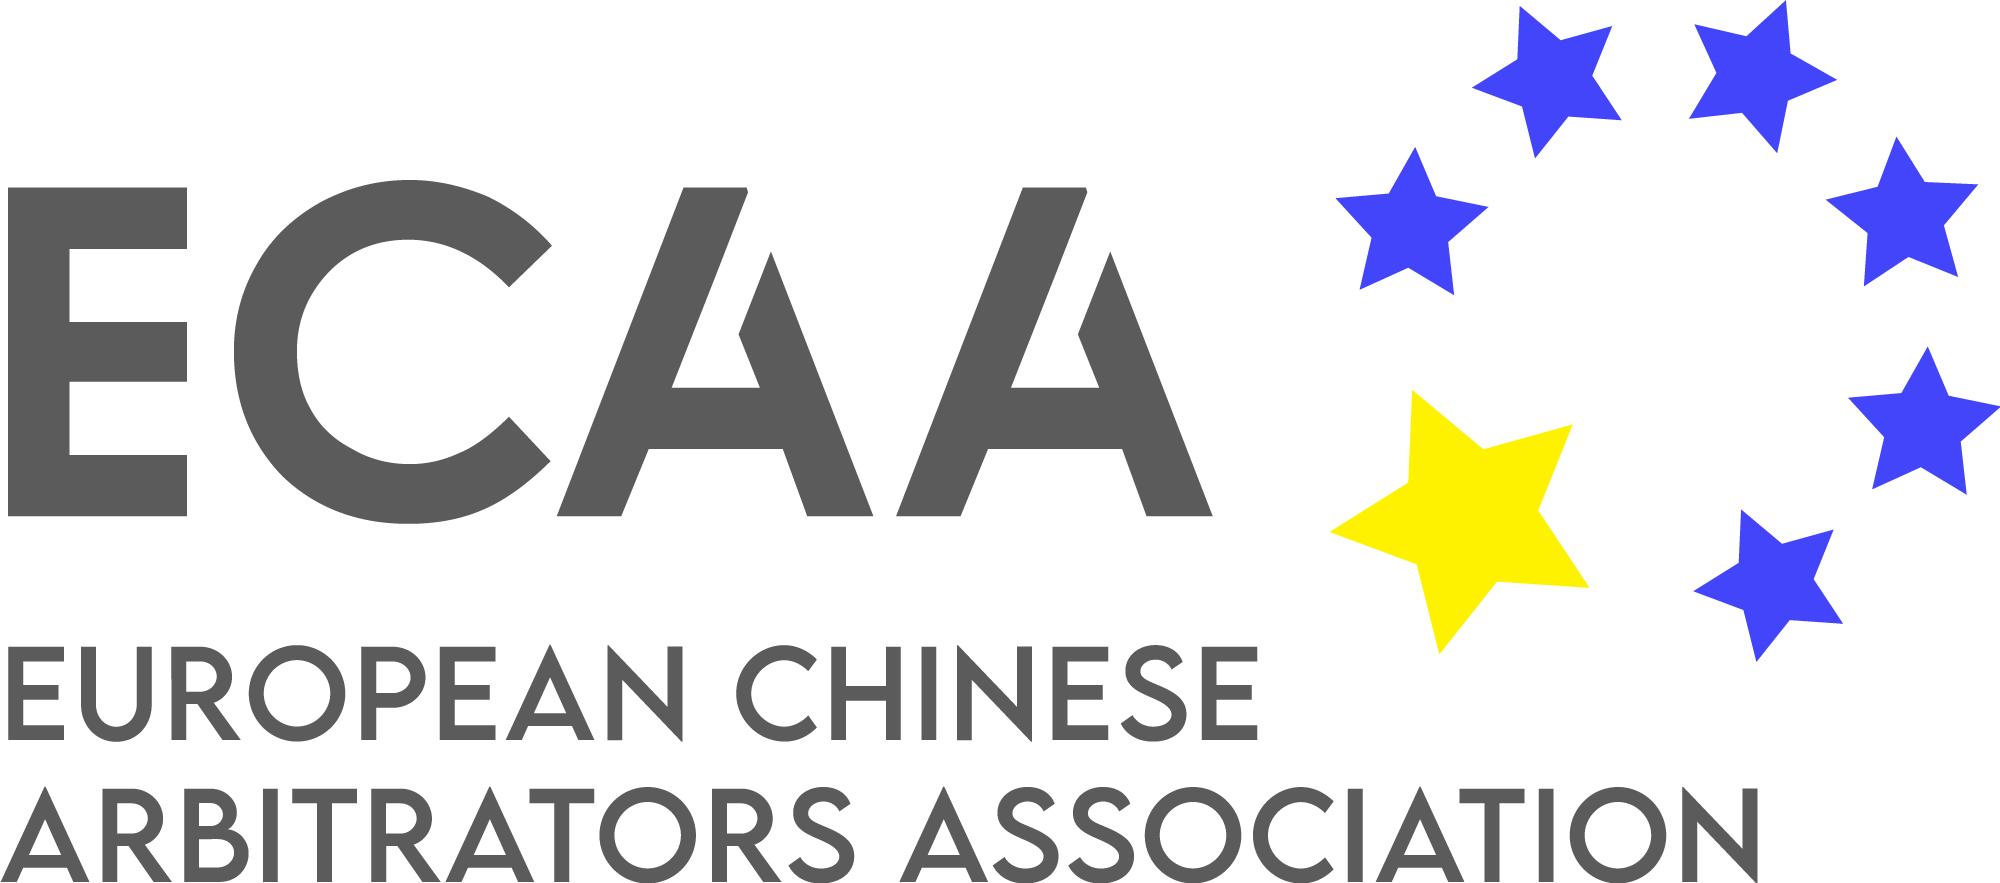 ECAA Arbitrators